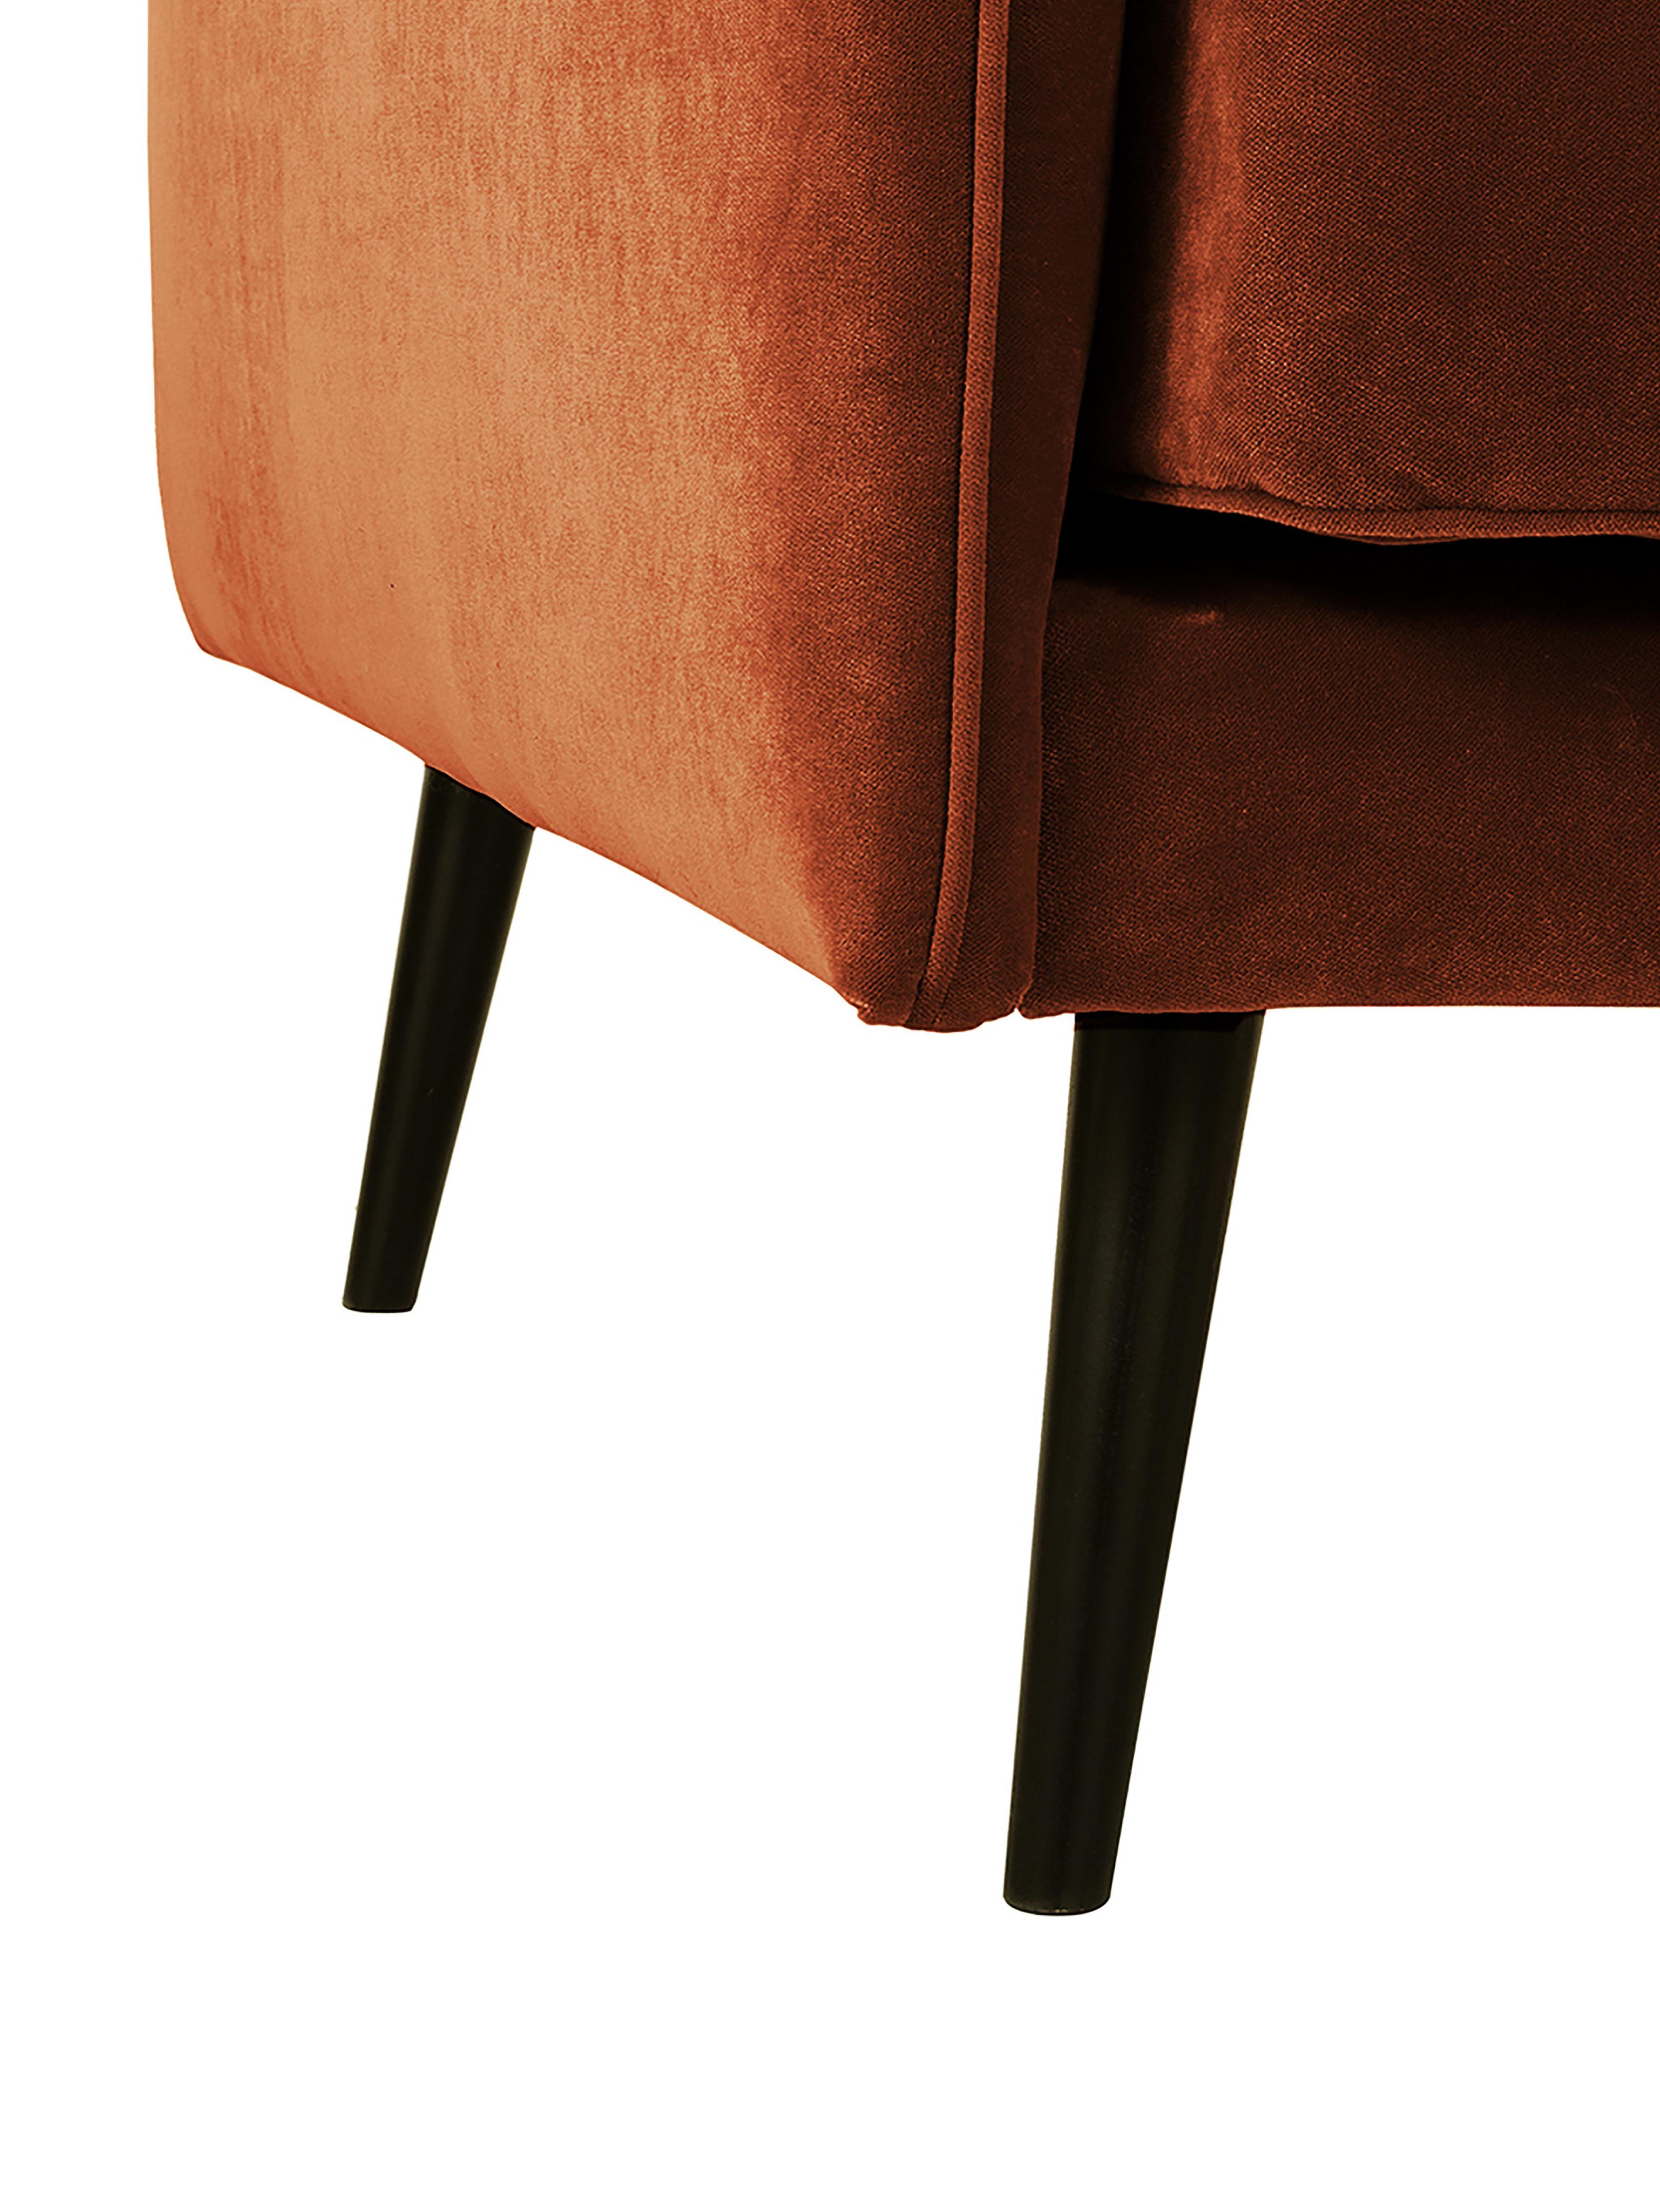 Fluwelen bank Paola (3-zits), Bekleding: fluweel (polyester), Frame: massief vurenhout, spaanp, Poten: gelakt vurenhout Het FSC-, Roestrood, B 209 x D 95 cm